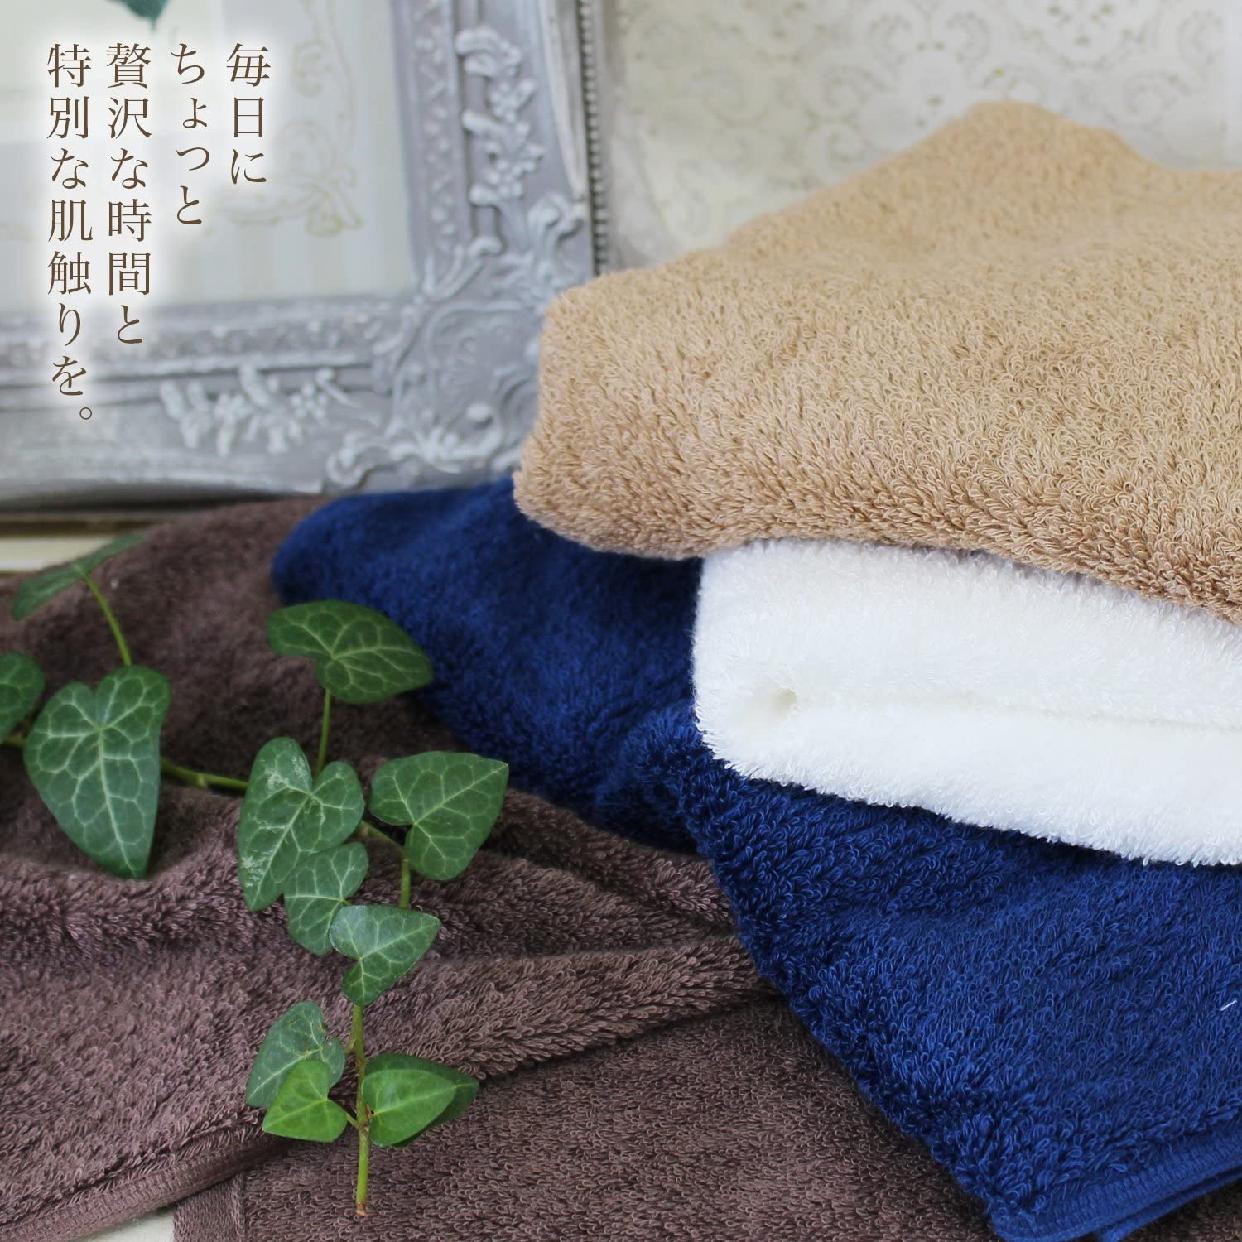 hiorie(ヒオリエ) ホテルスタイルタオルの商品画像6